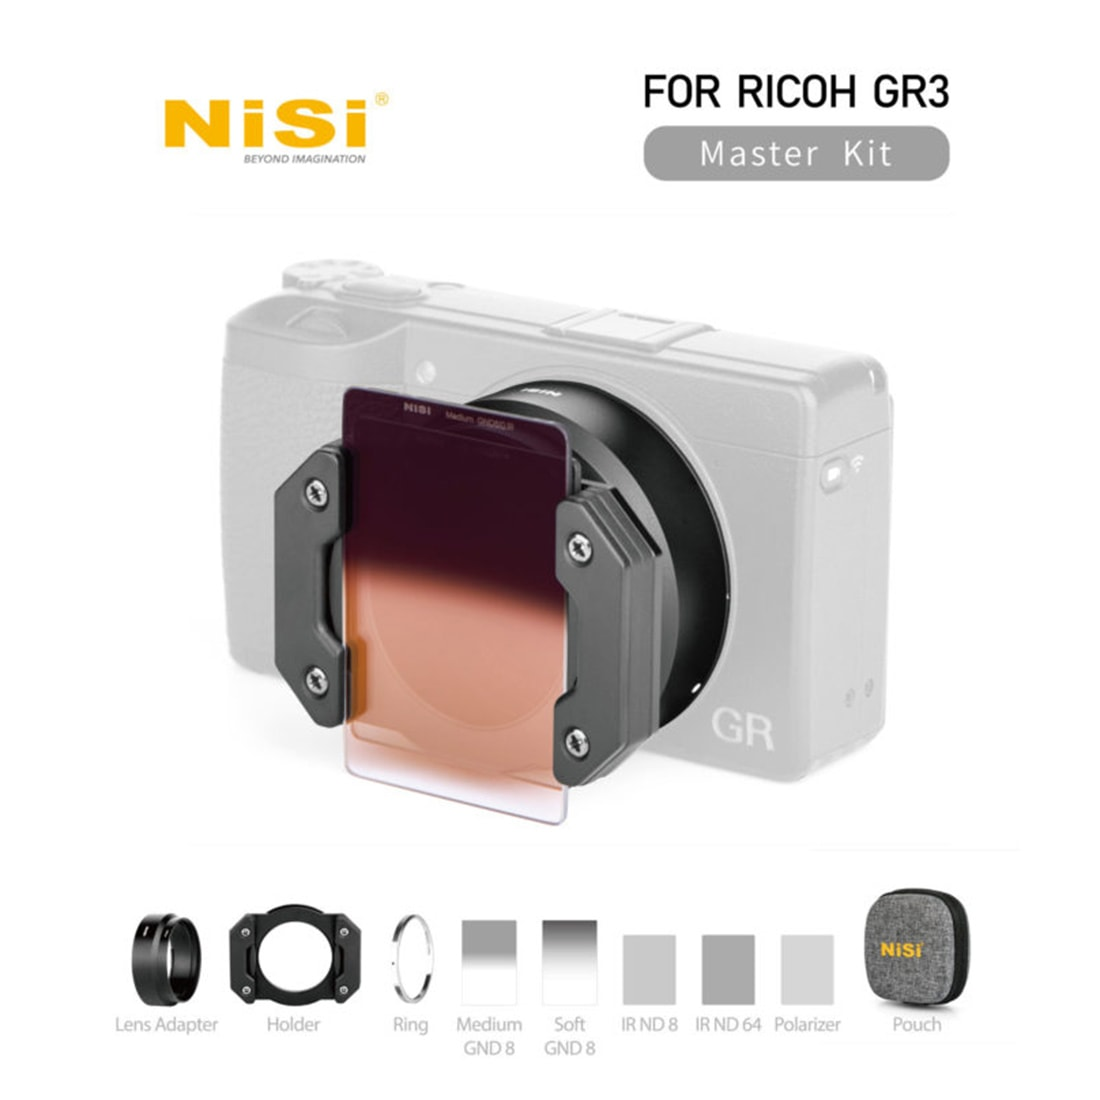 NiSi Ricoh GR3 Master Kit